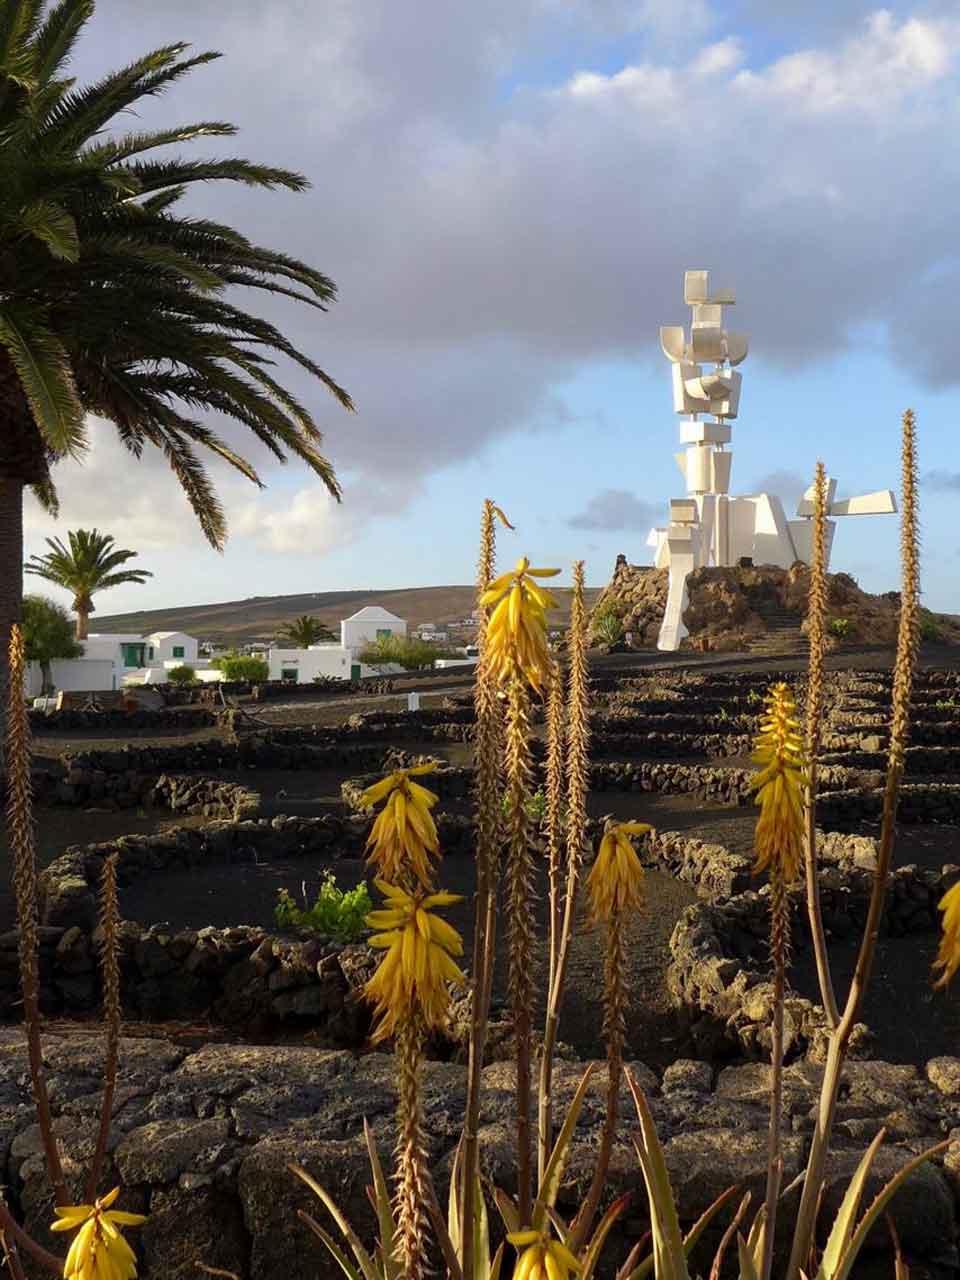 Casa Museo del Campesino Manriques 'Monumento al Campesino'